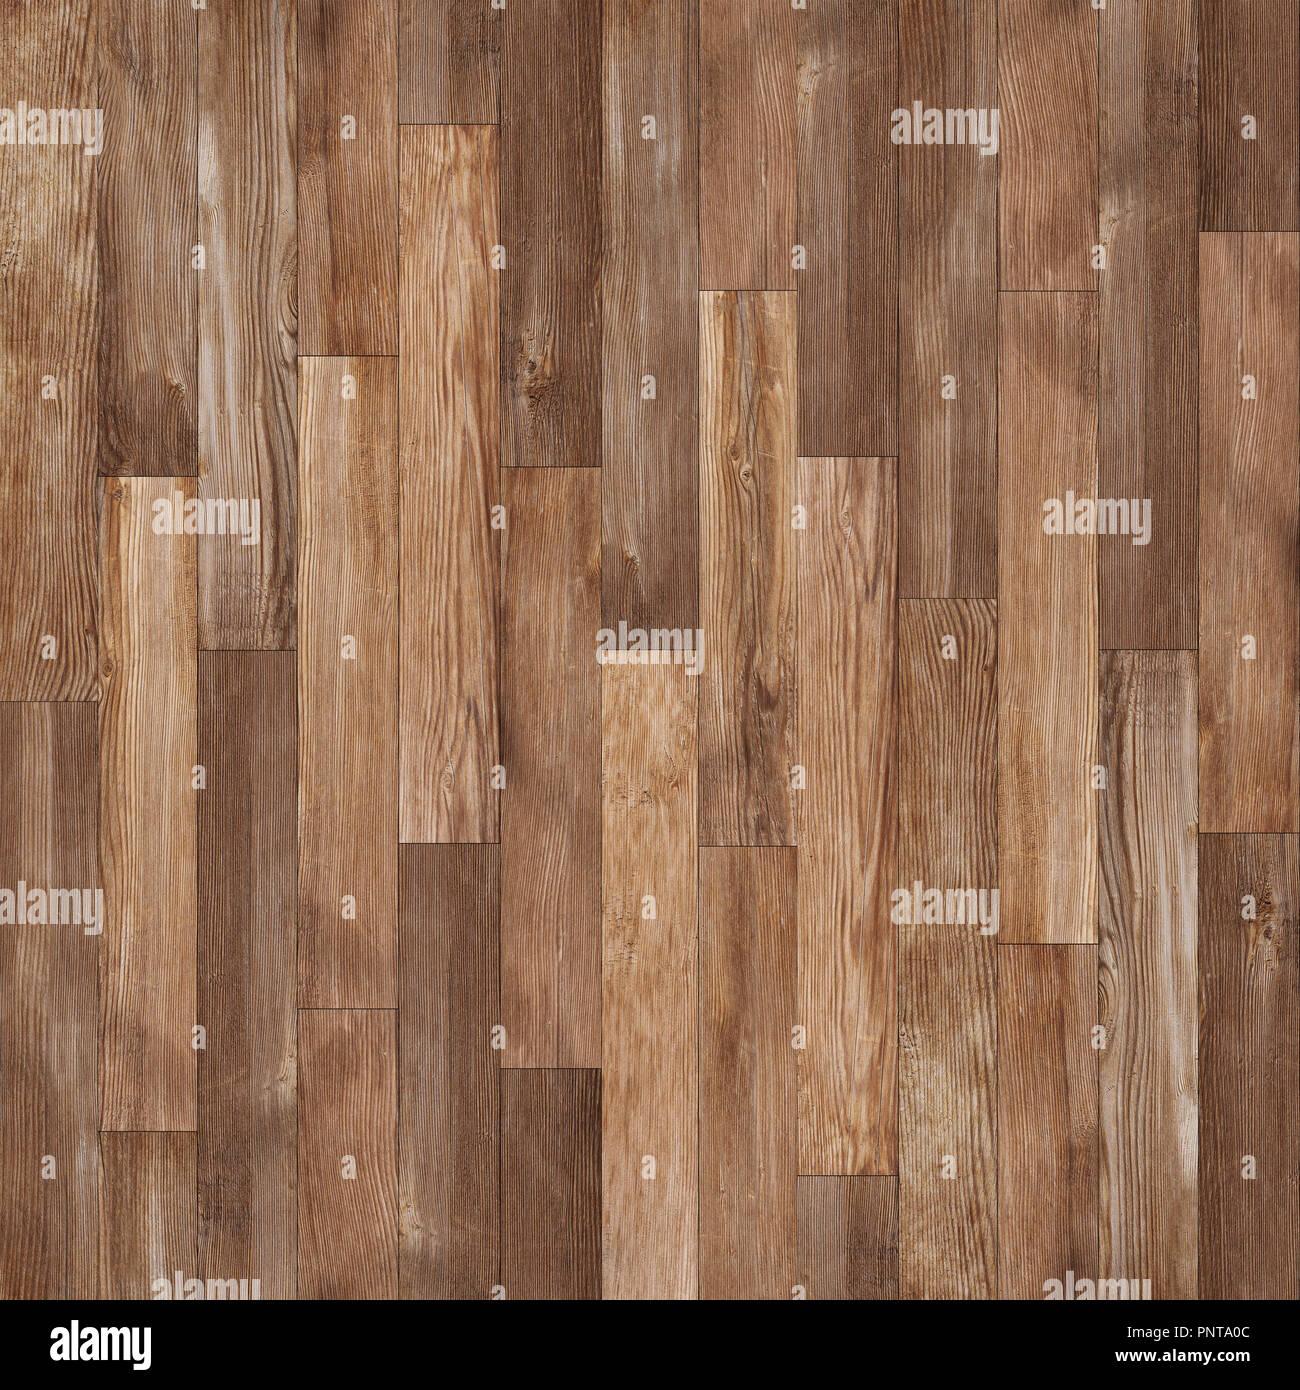 Seamless wood texture, hardwood floor texture background - Stock Image